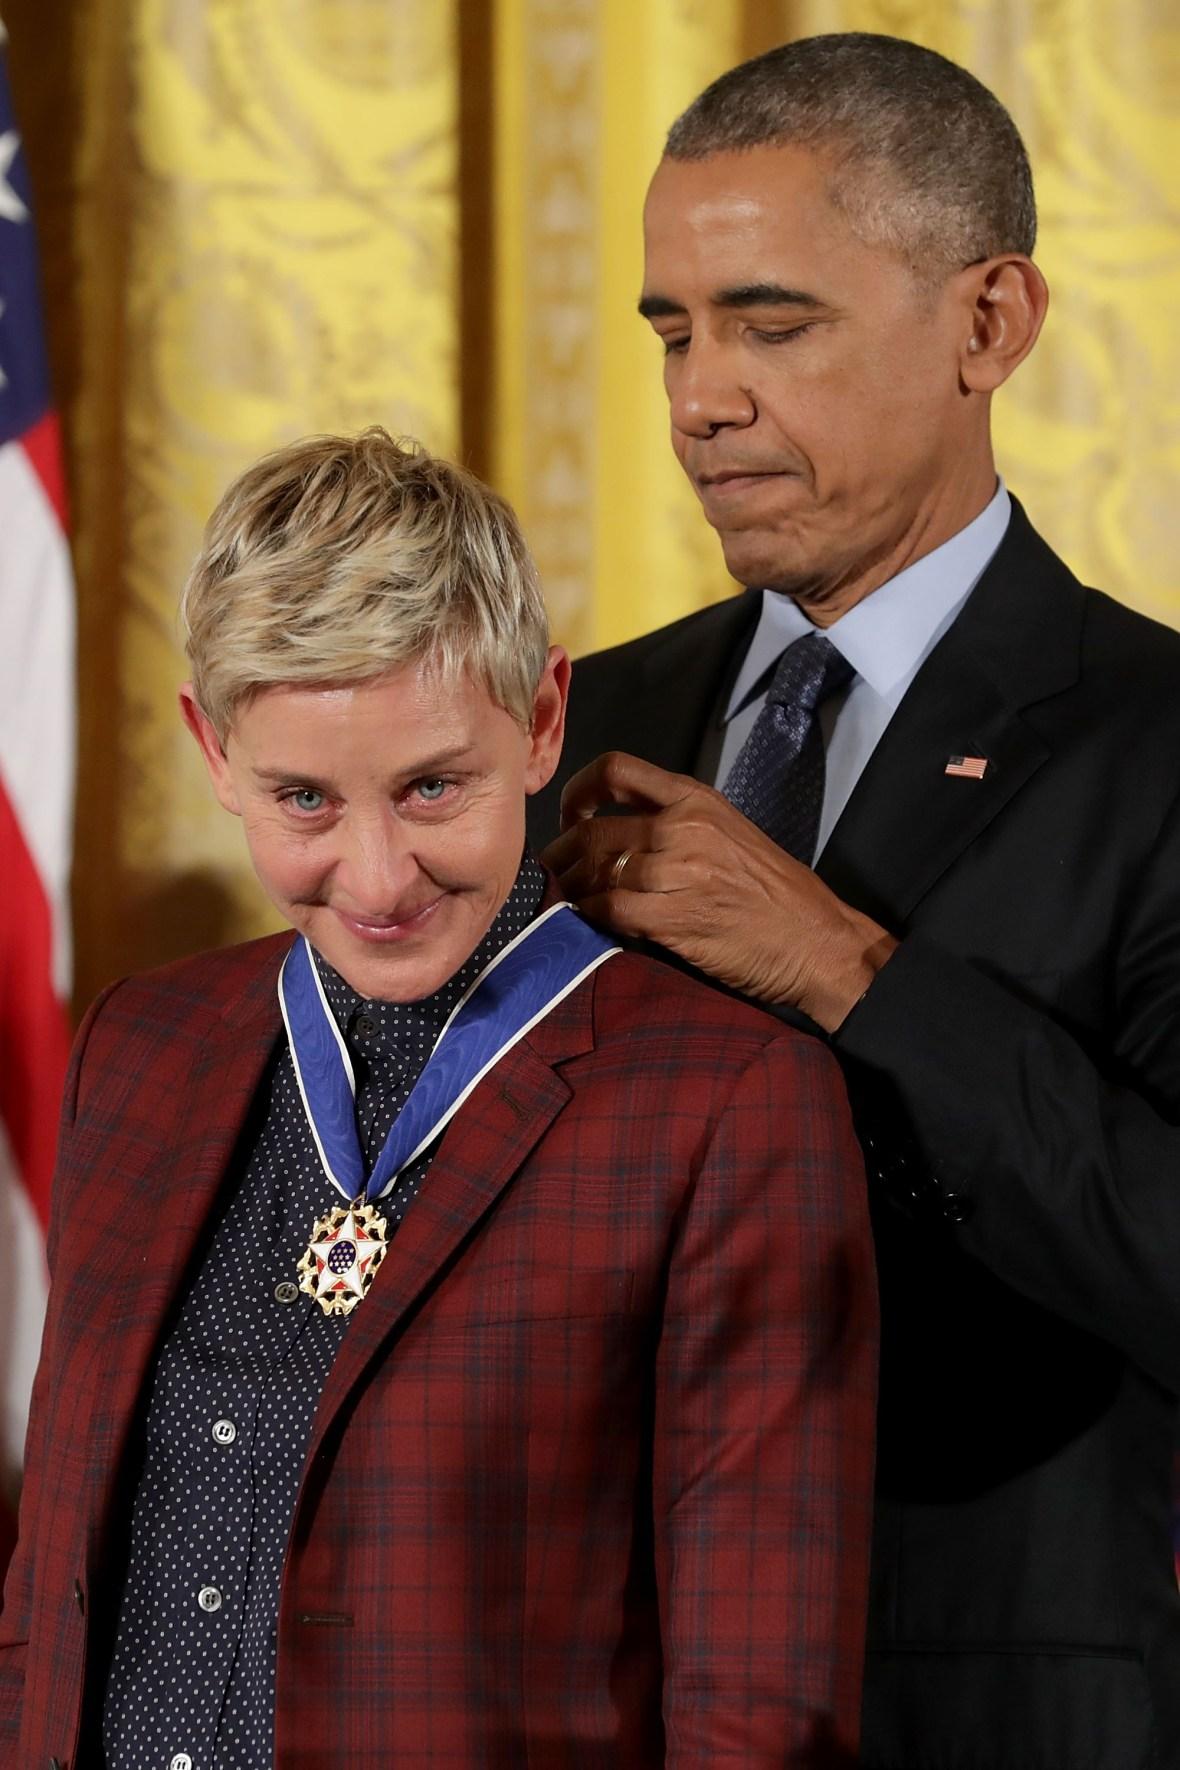 ellen degeneres presidential medal of freedom getty images